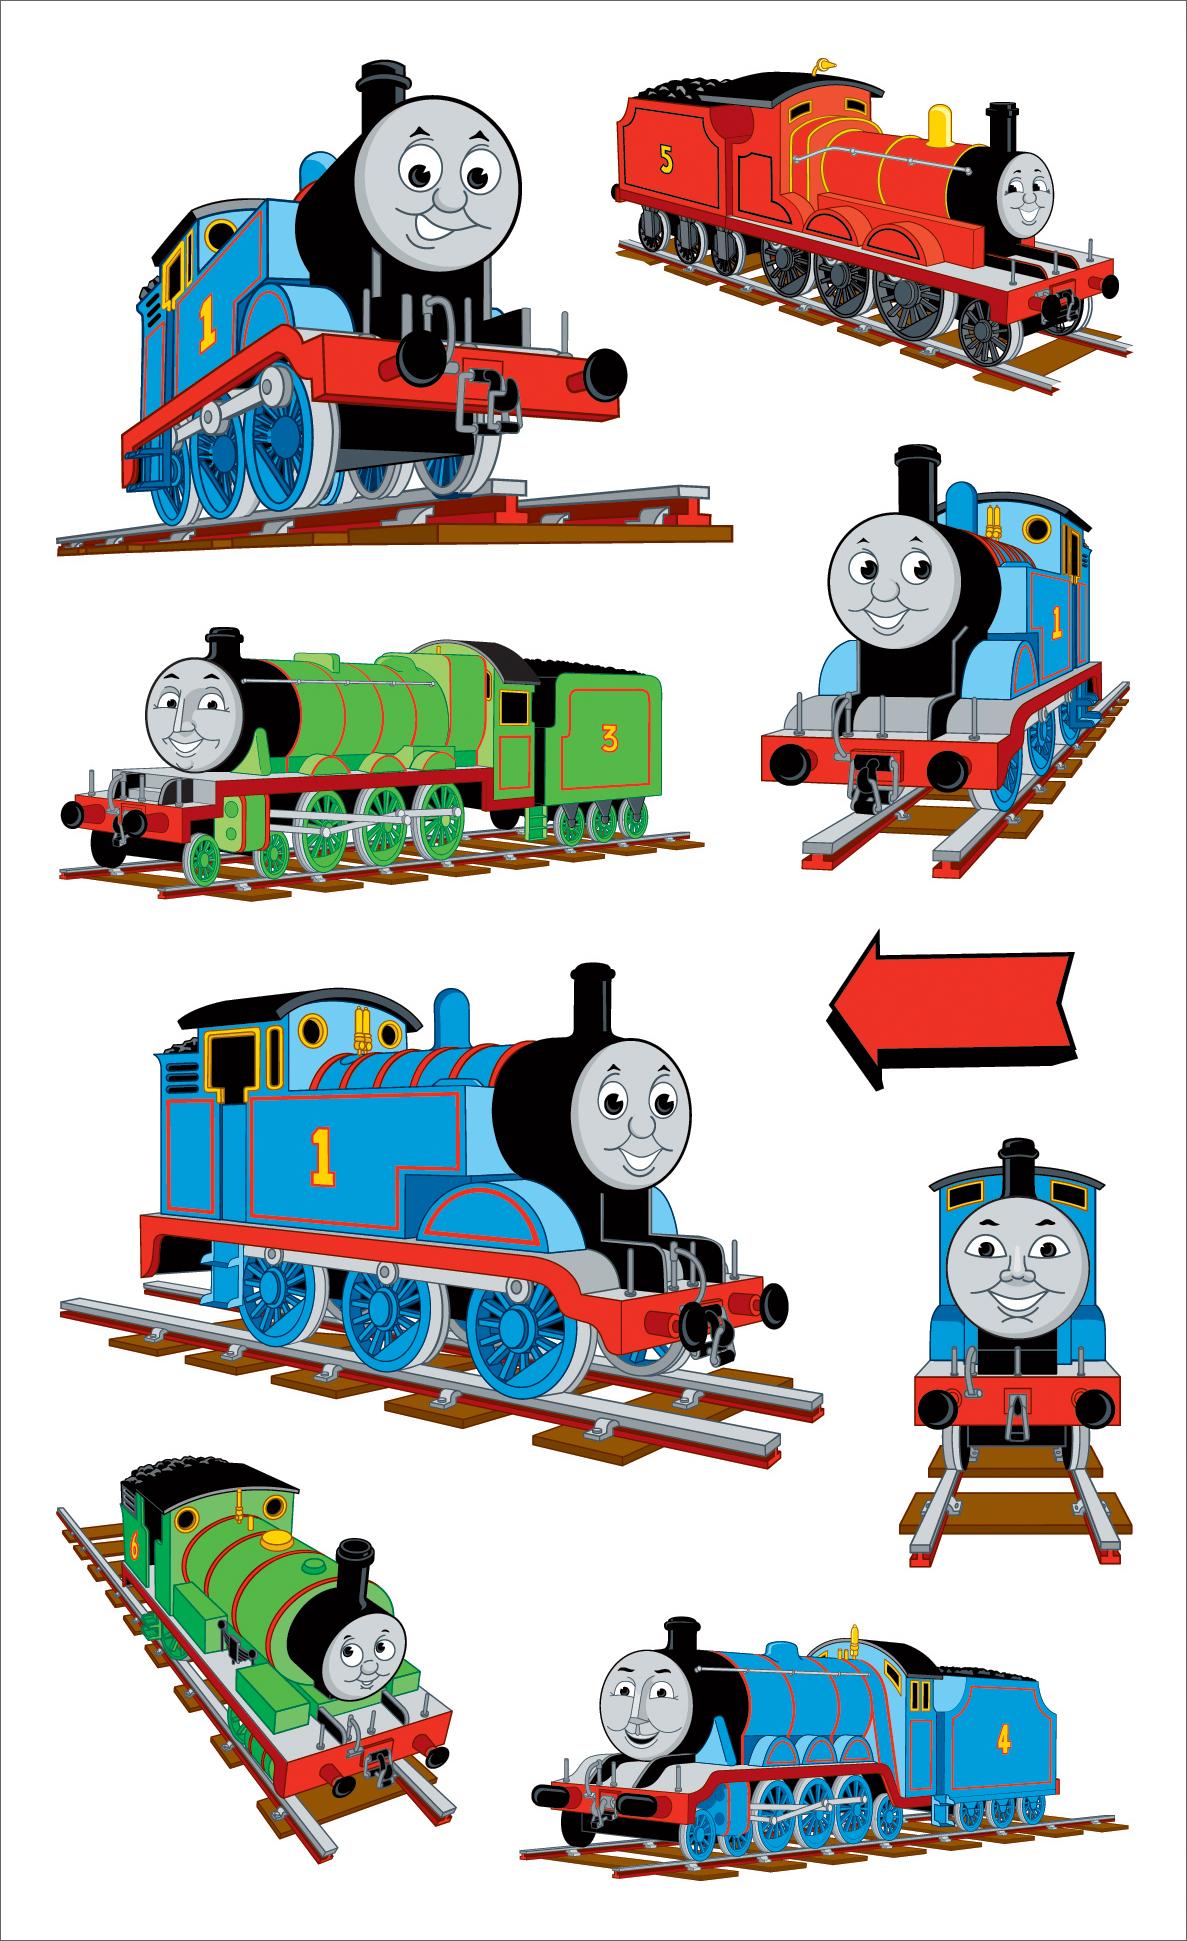 Thomas and Friends Wallpaper HD - WallpaperSafari Thomas And Friends Wallpaper Border